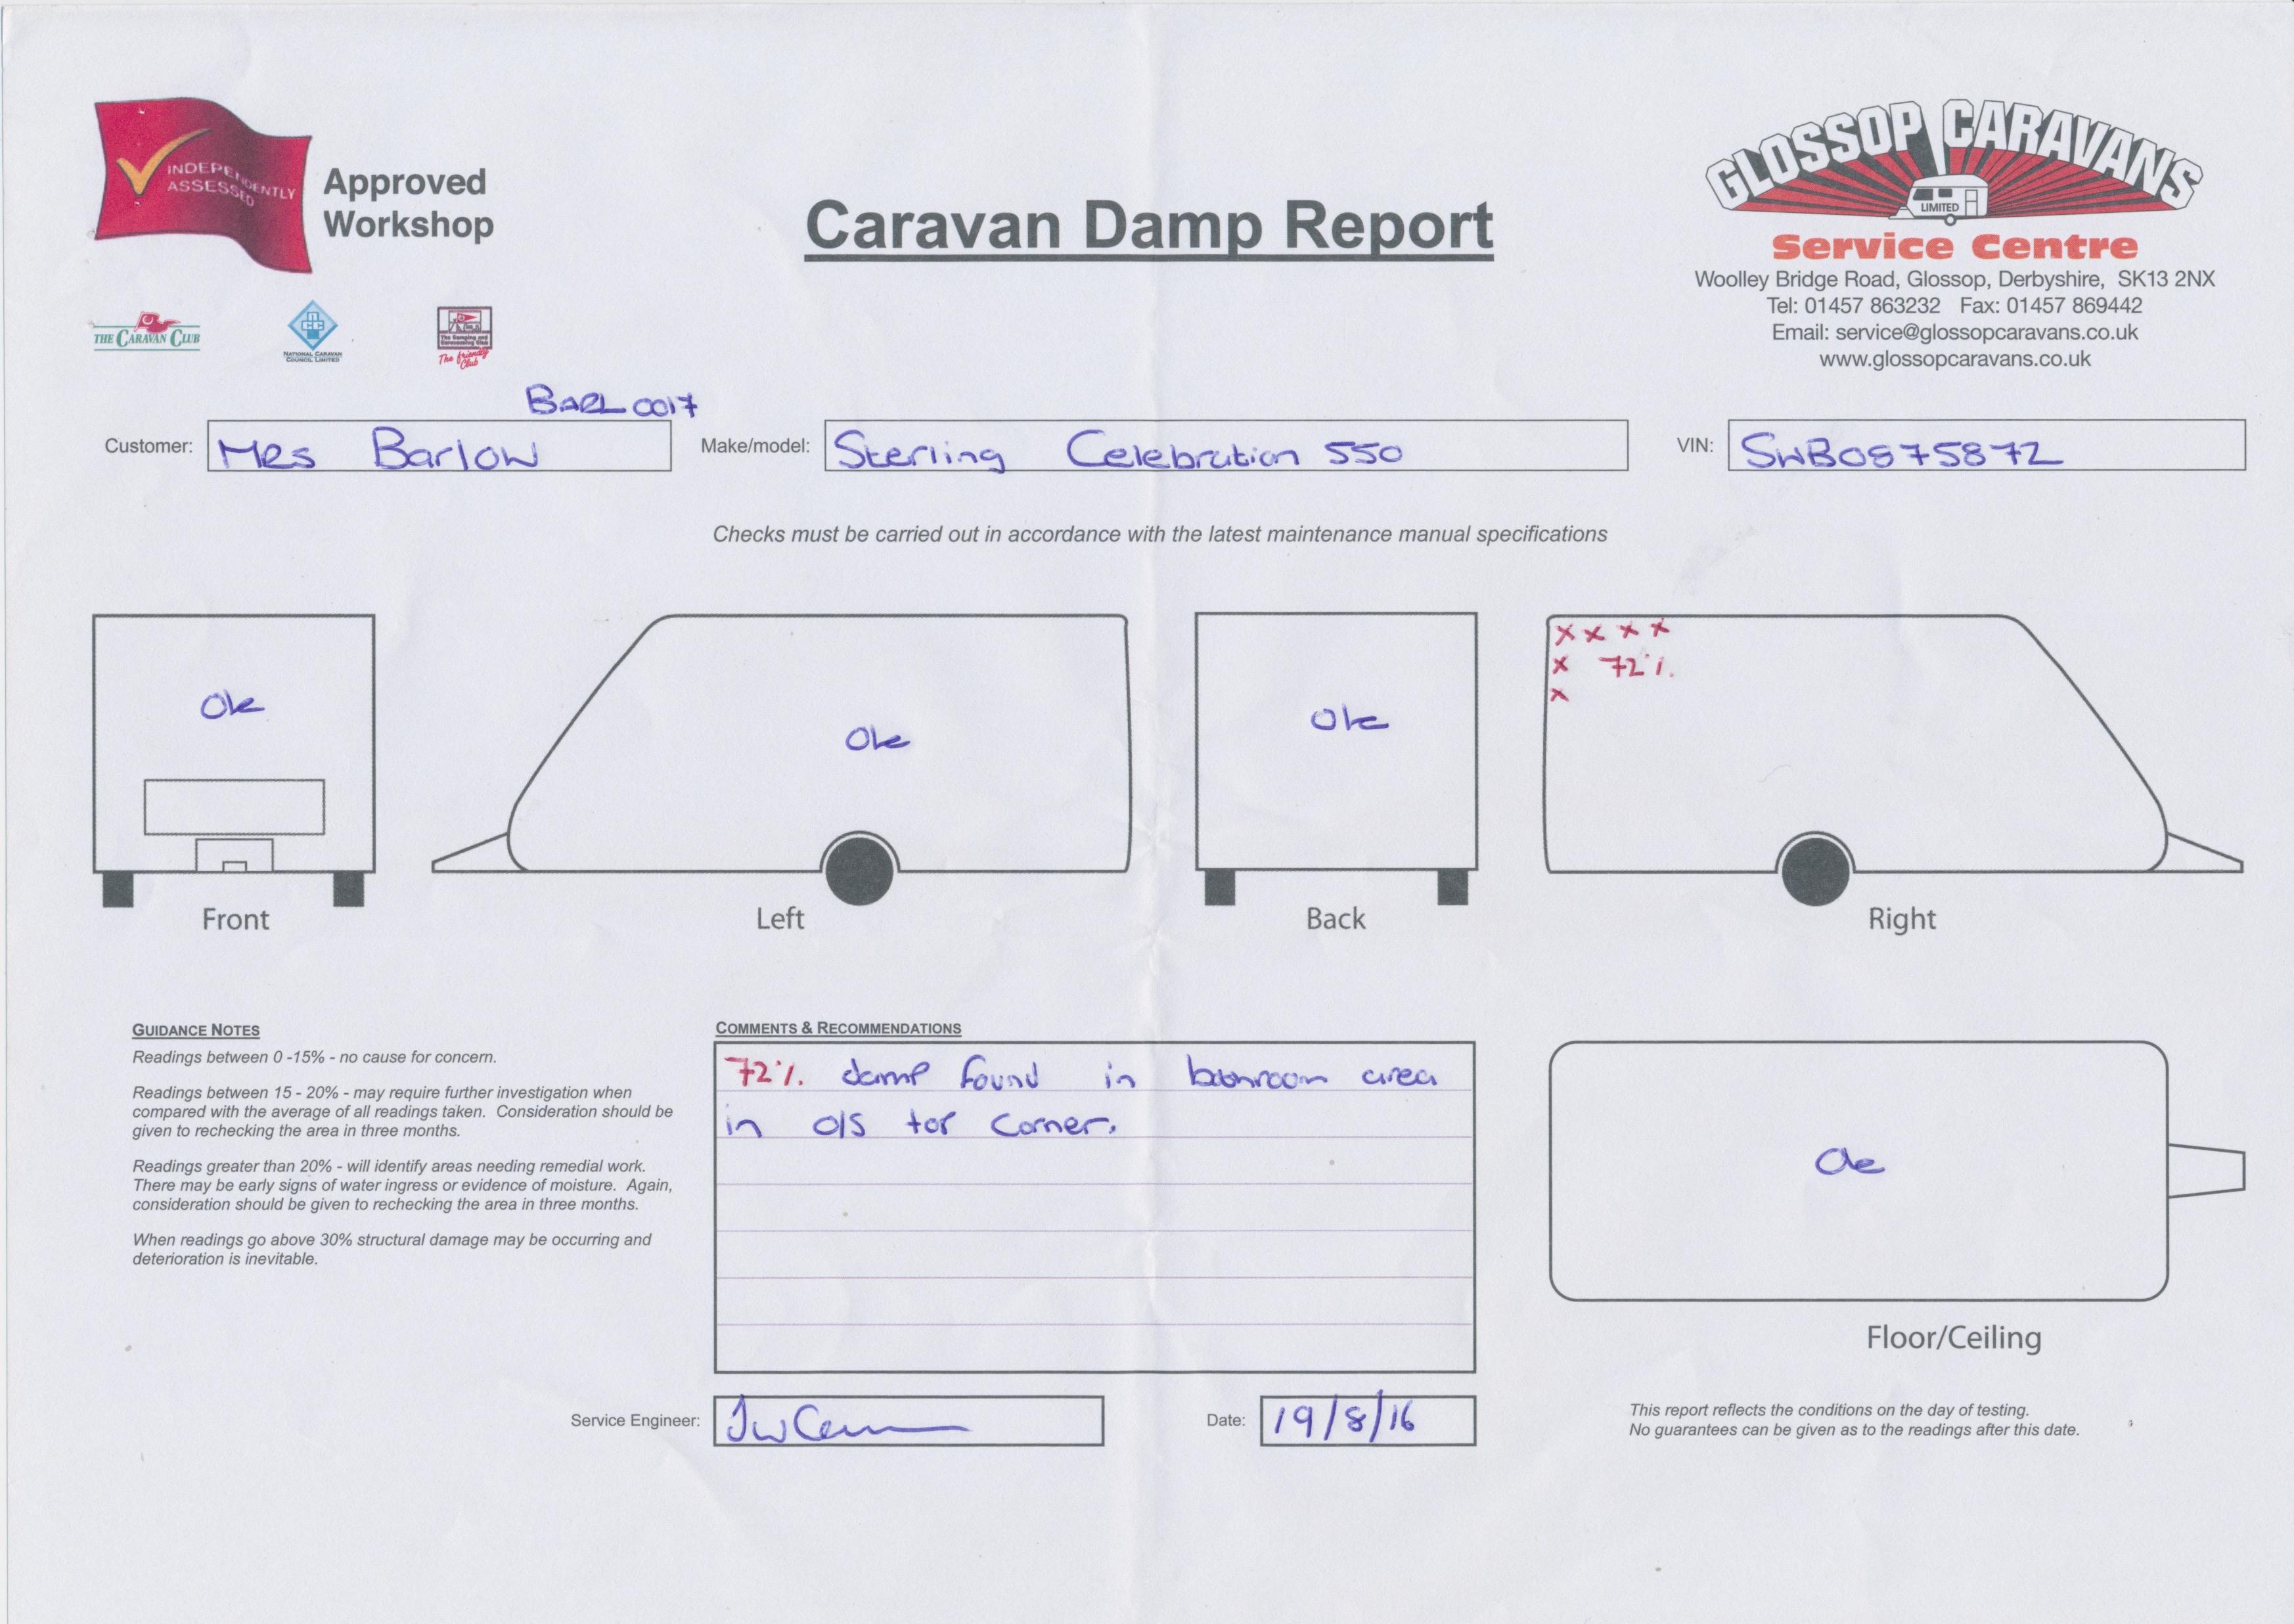 Elddis Caravan Wiring Diagram Electrical Diagrams Crusader Schematic Solar Pv System Buccaneer Enthusiast